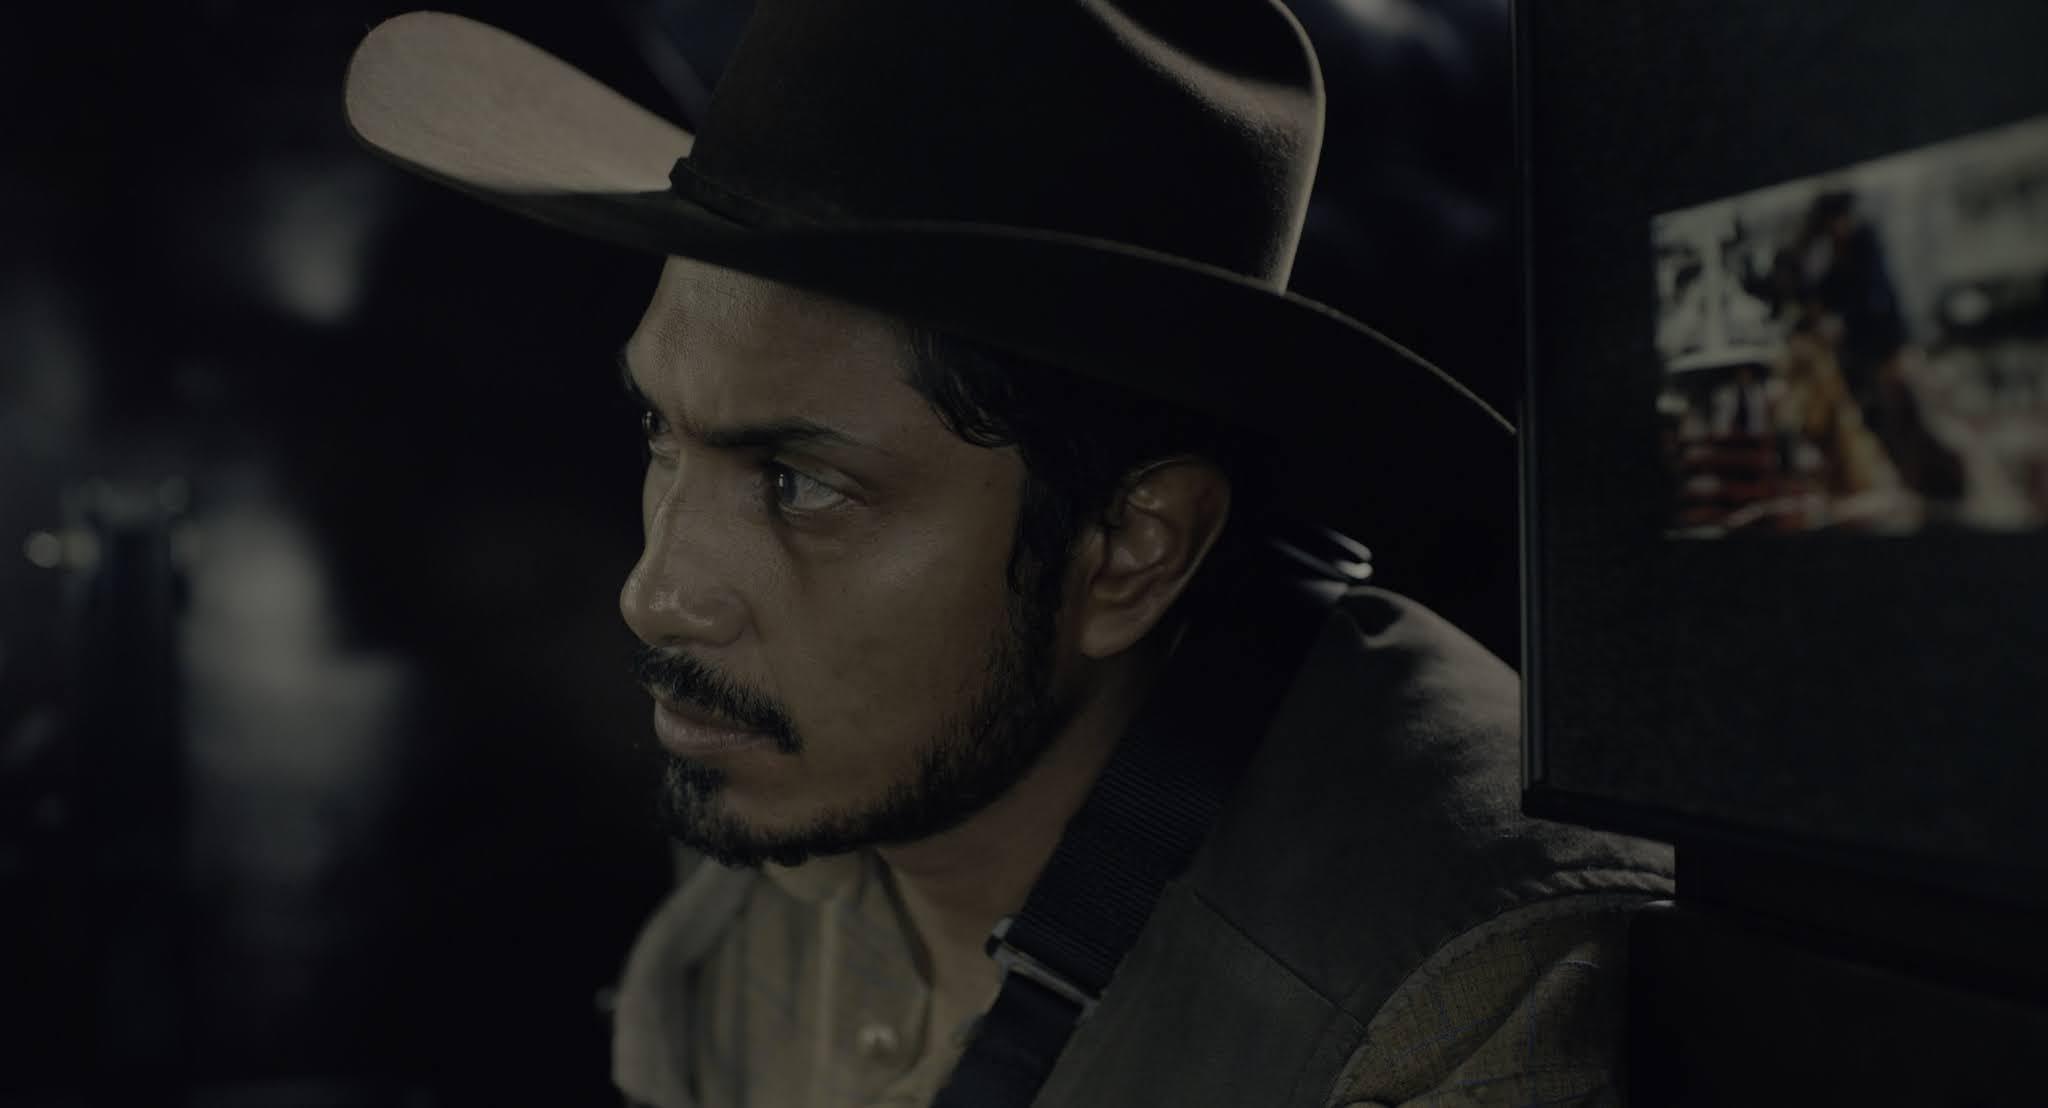 La purga por siempre (2021) 4k WEB-DL HDR Latino